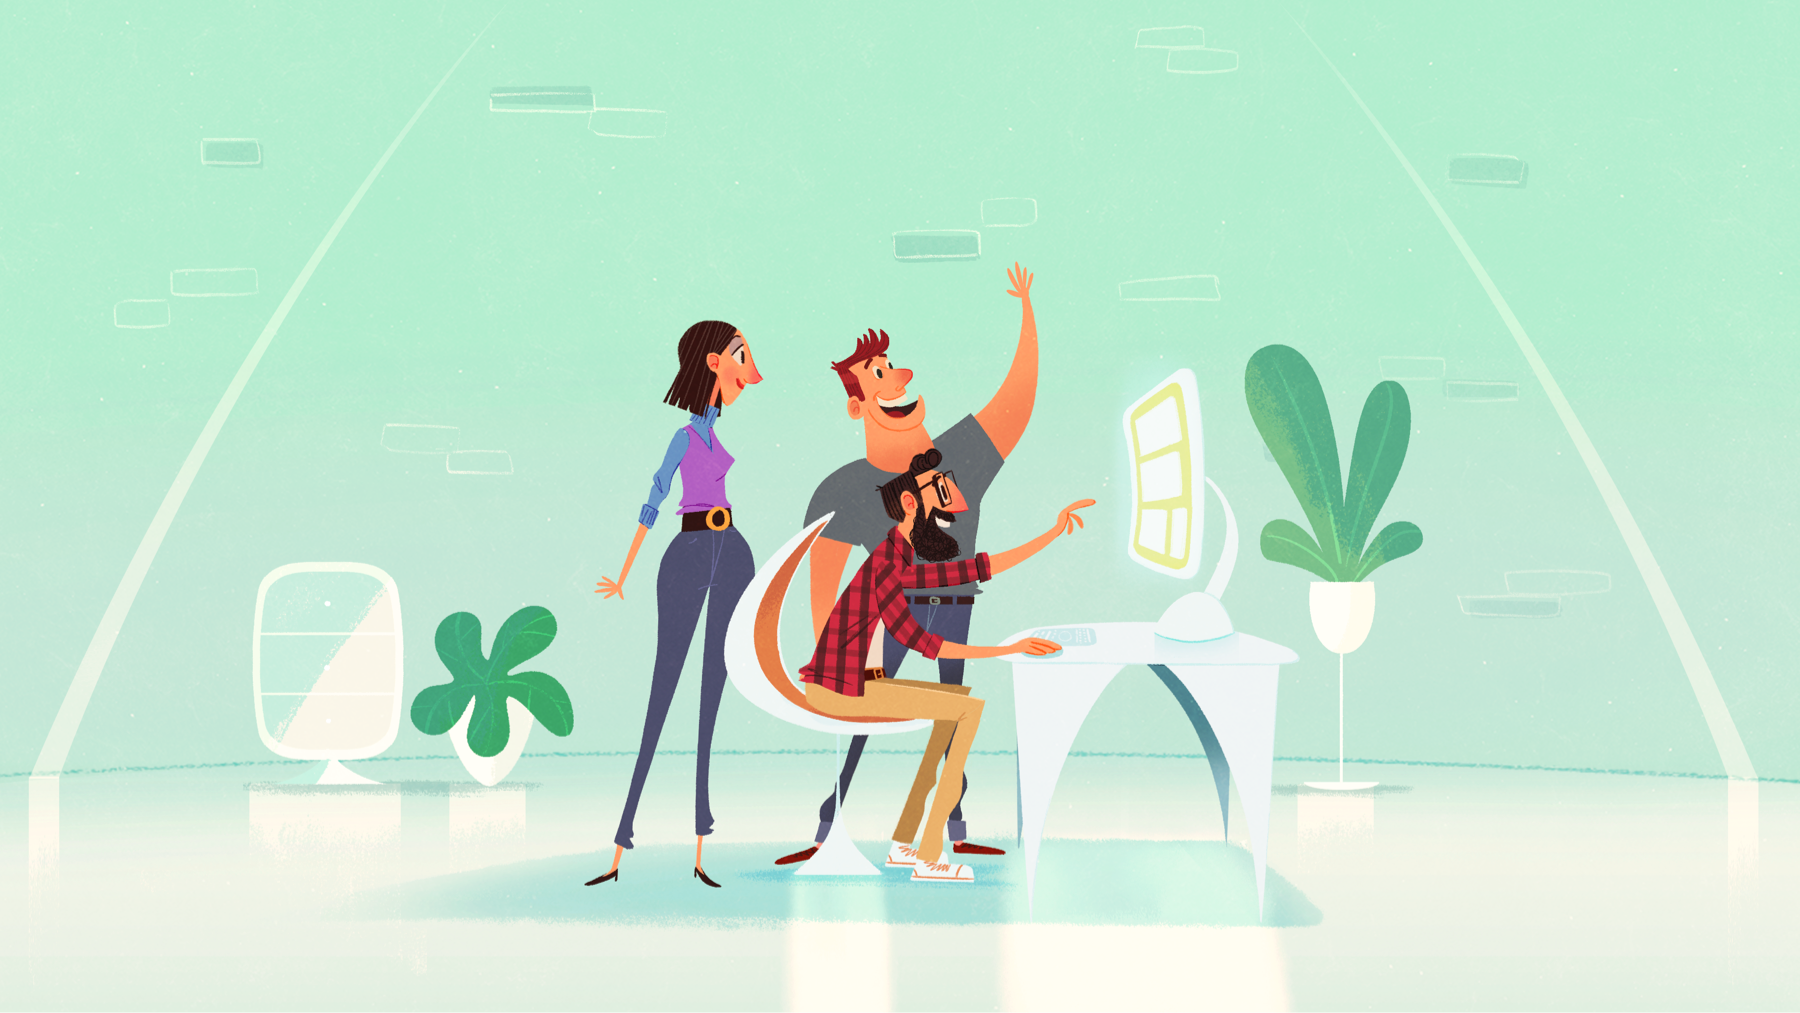 Creative agency wins at web design, actually makes money